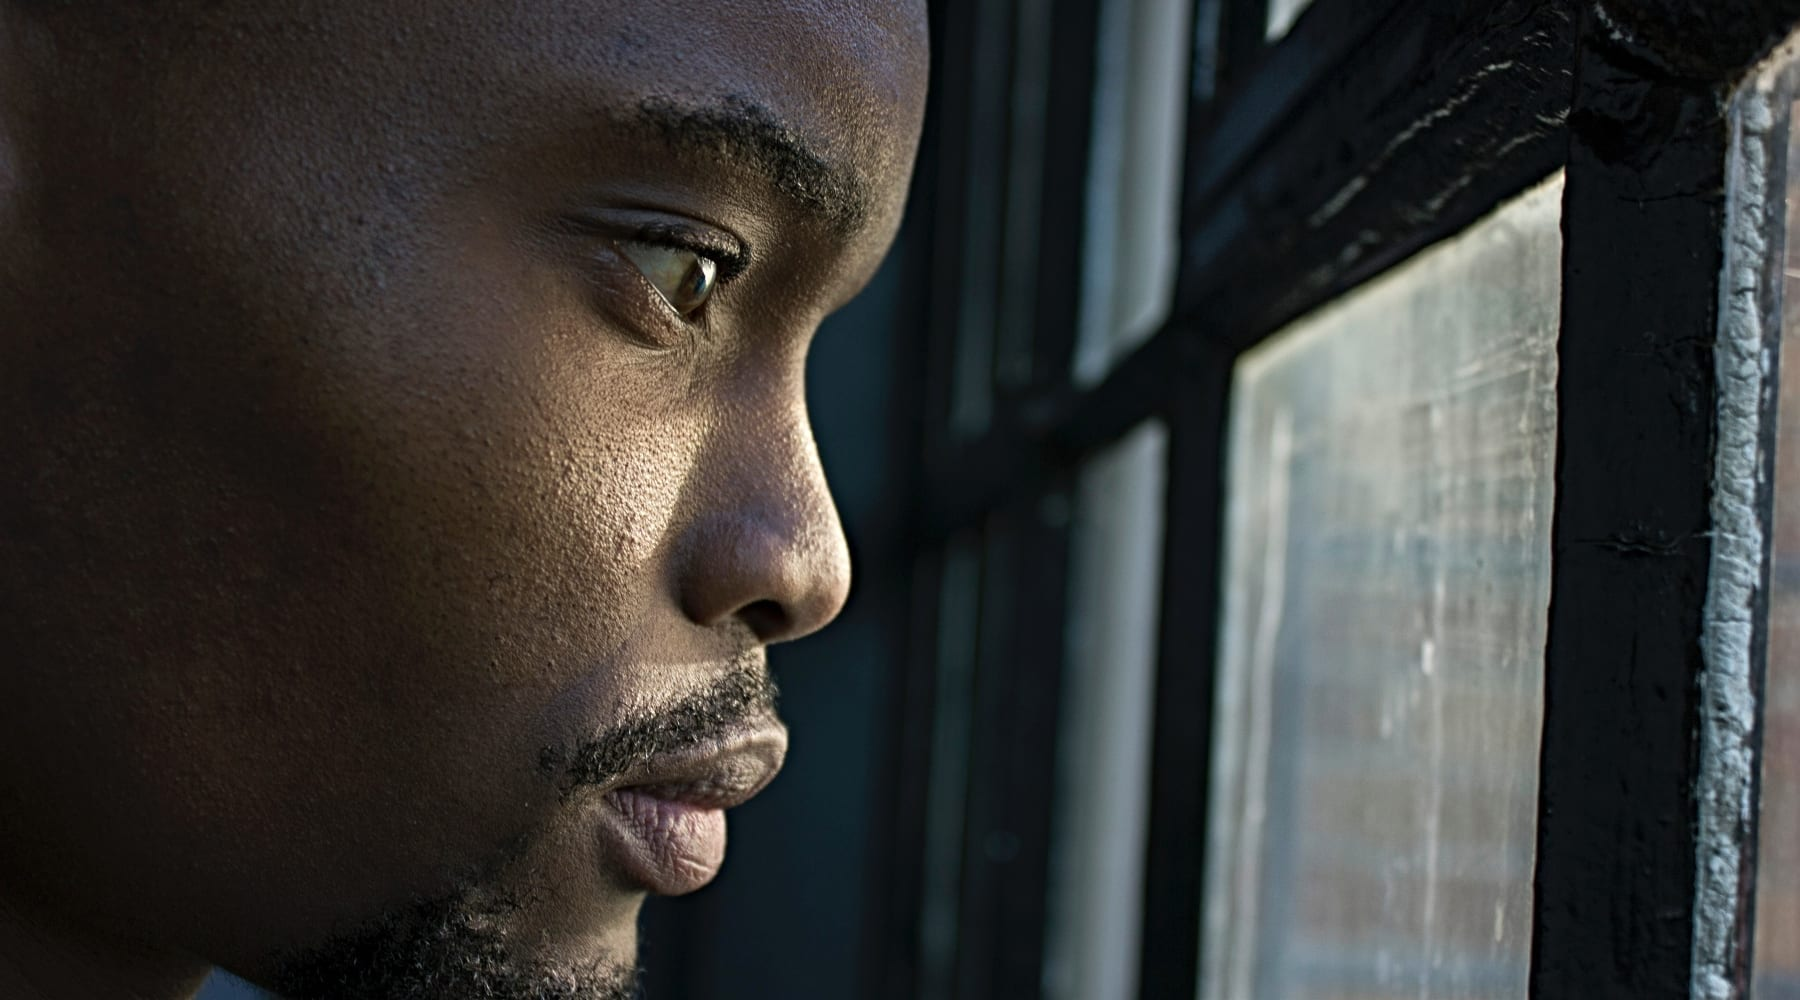 Slavery's Legacy Still Negatively Affects Black Americans, Majority Says